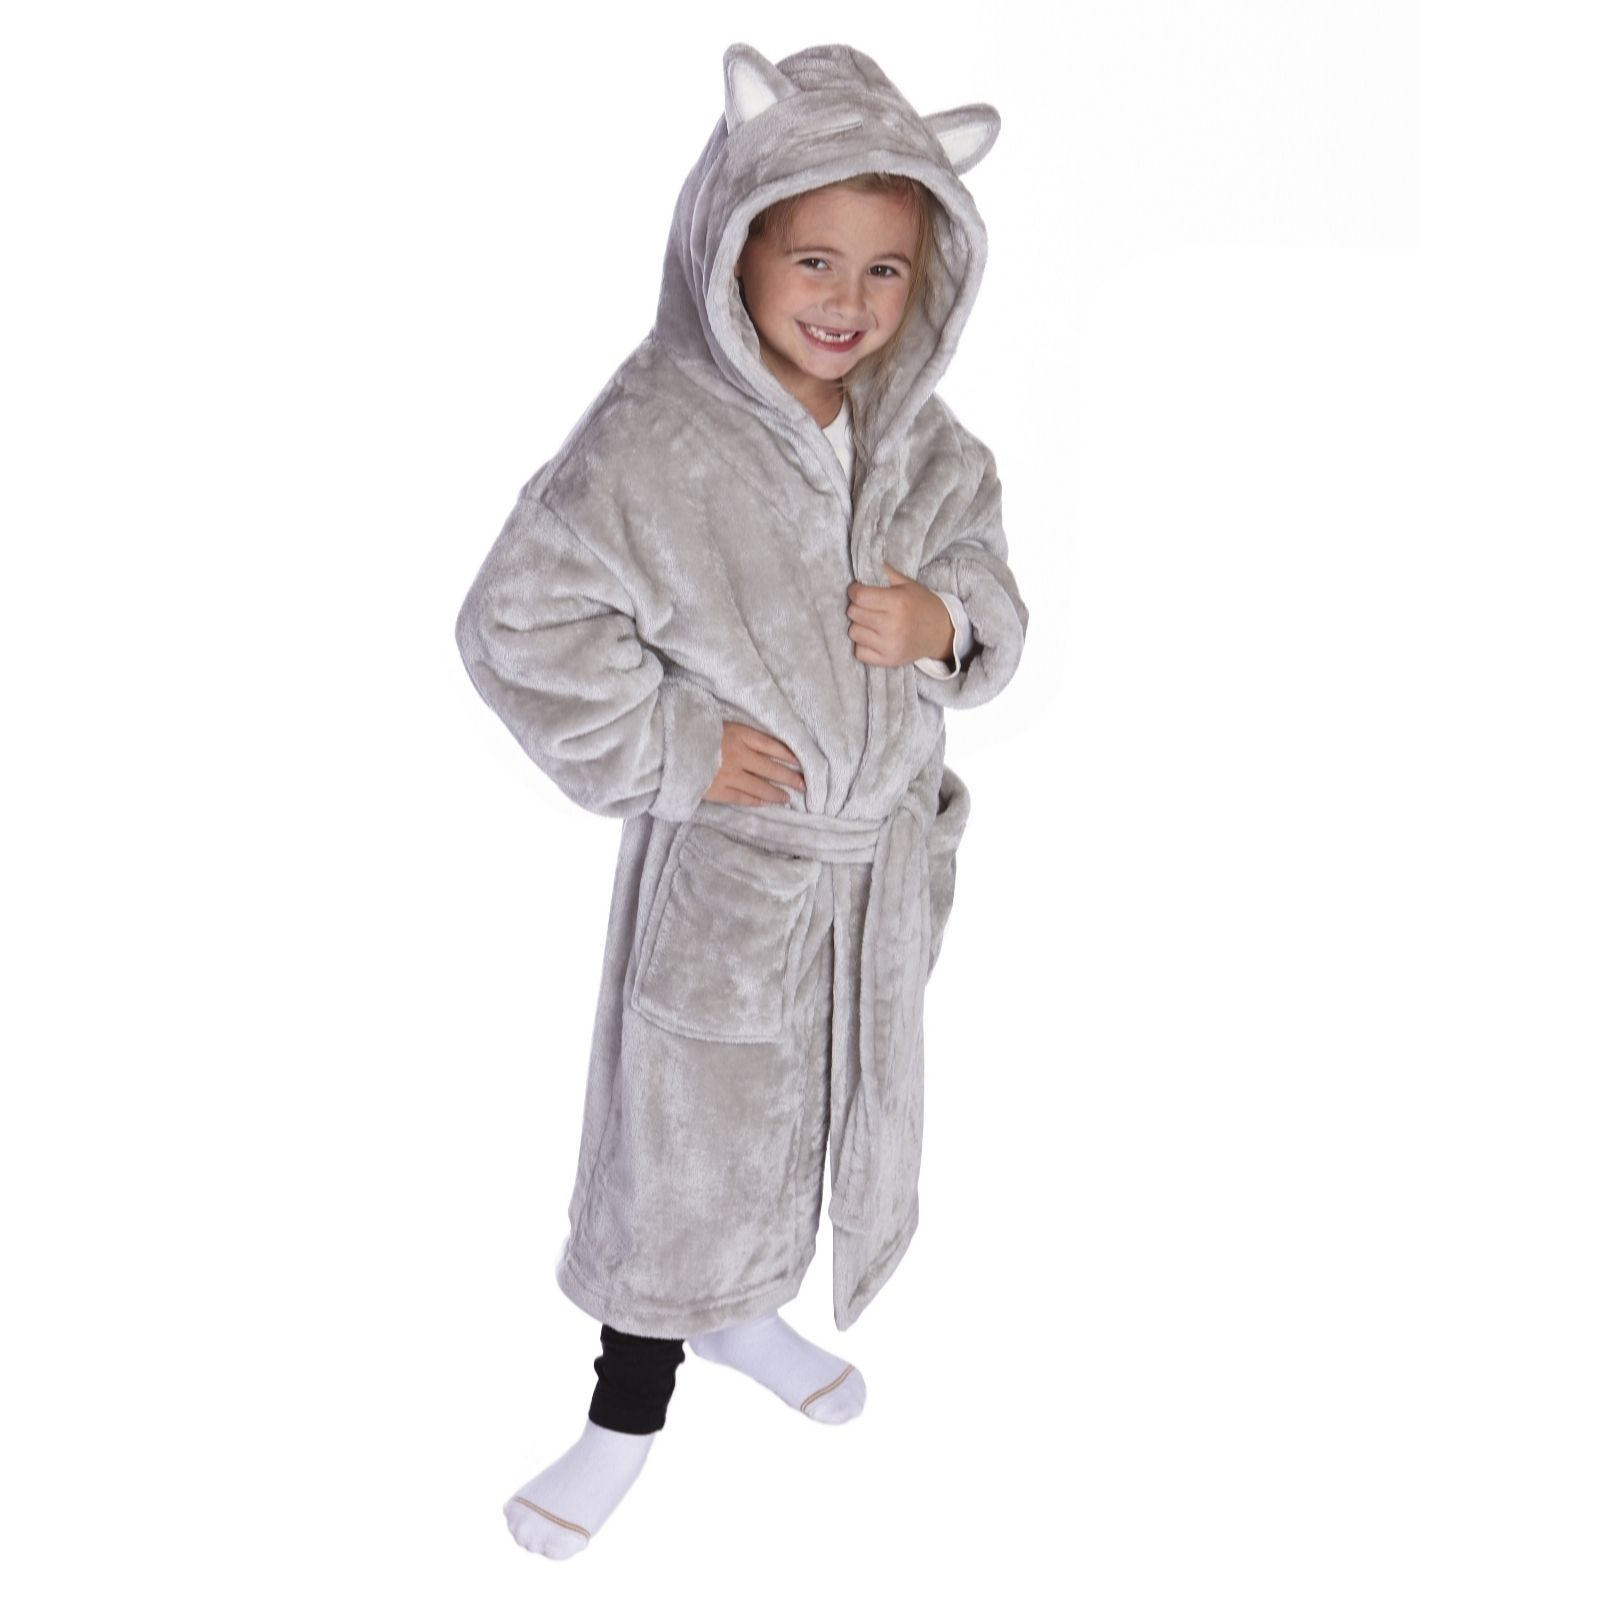 dfba79375909b Cozee Home Children's Hooded Robe - QVC UK